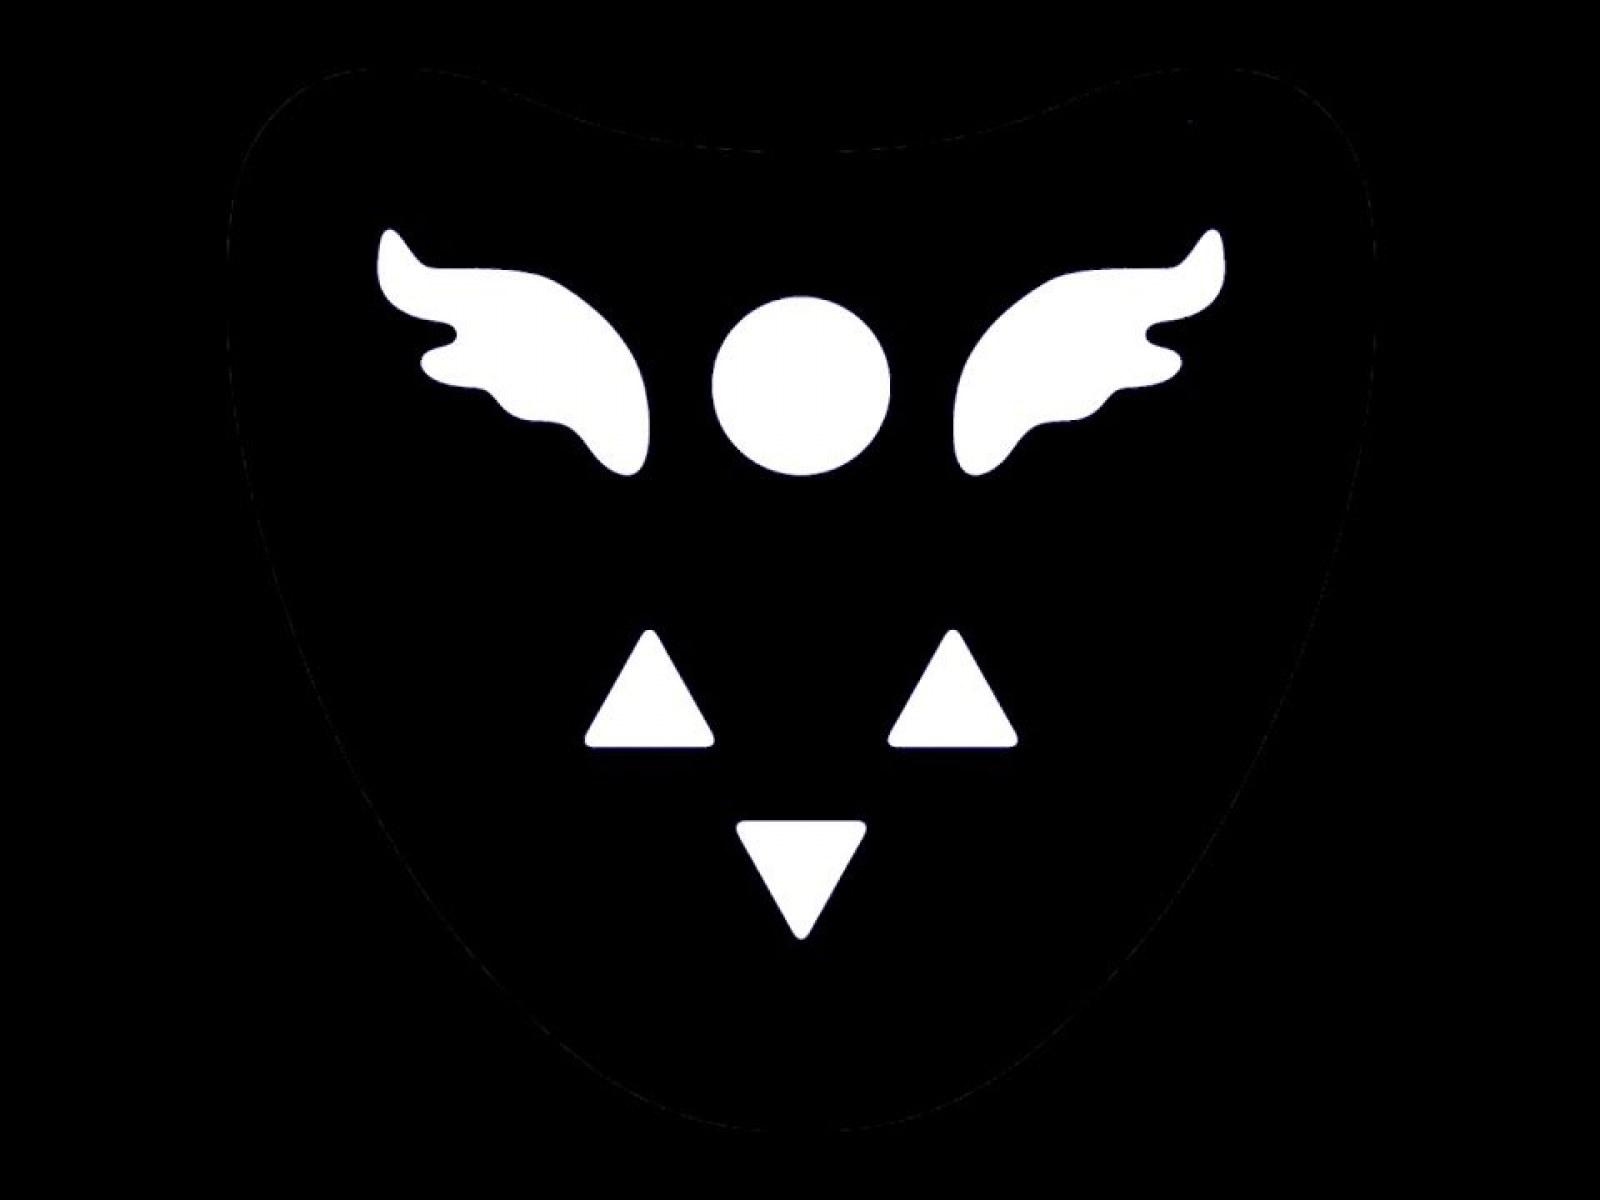 How To Download Delta Rune Free Sequel To Undertale Drops On Halloween